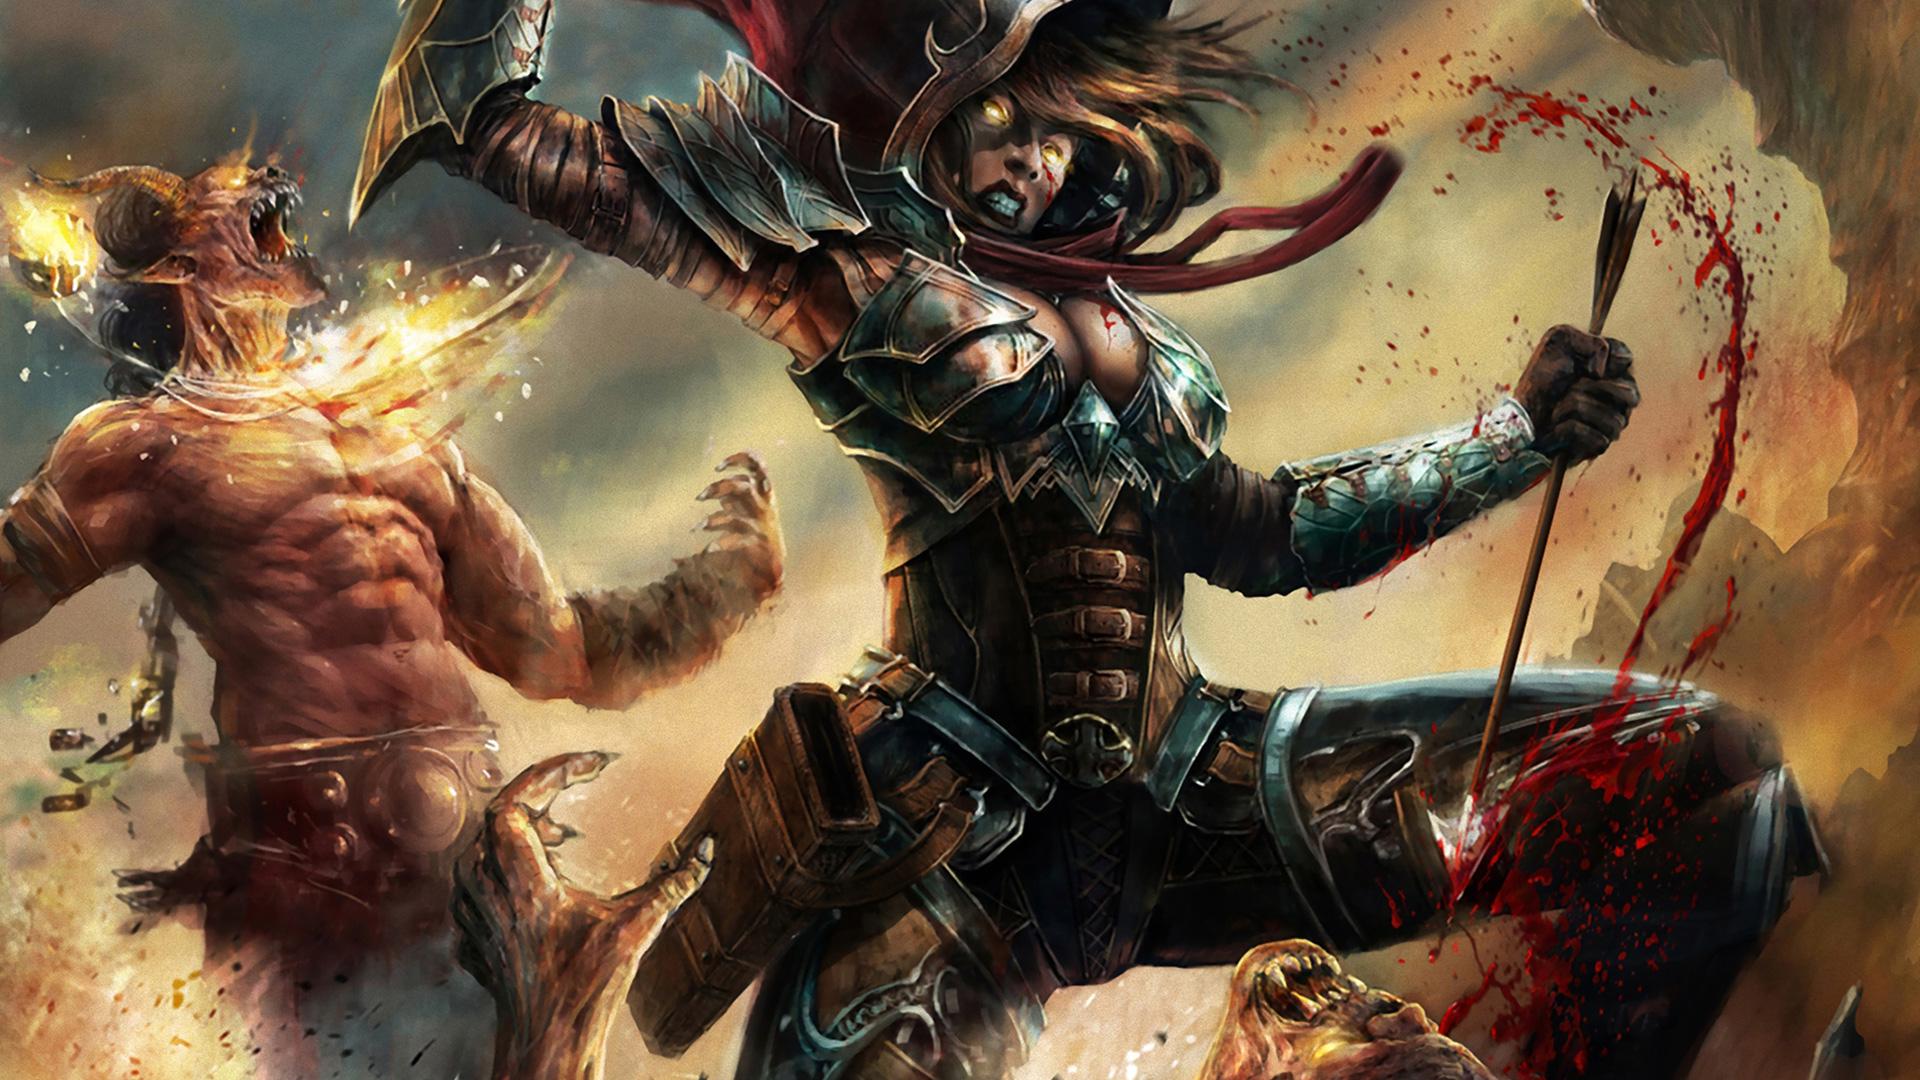 Diablo 3 wallpaper 41